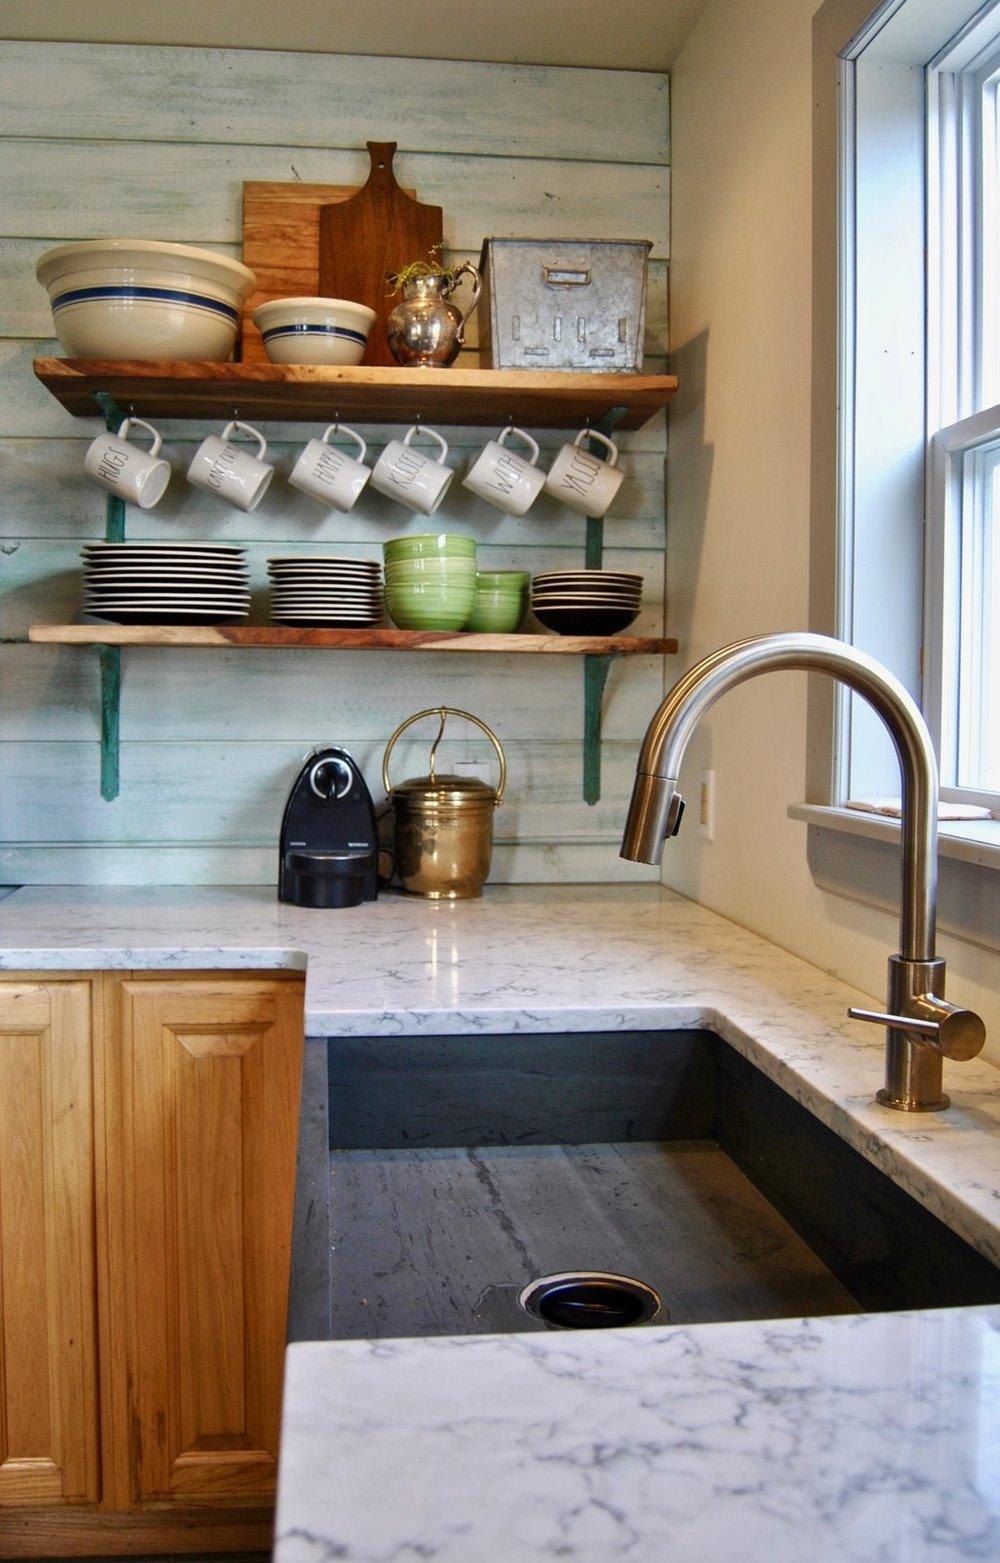 Custom, Maine-made slate sink  Photo: Wicked Awesome Maine Vacation Rentals